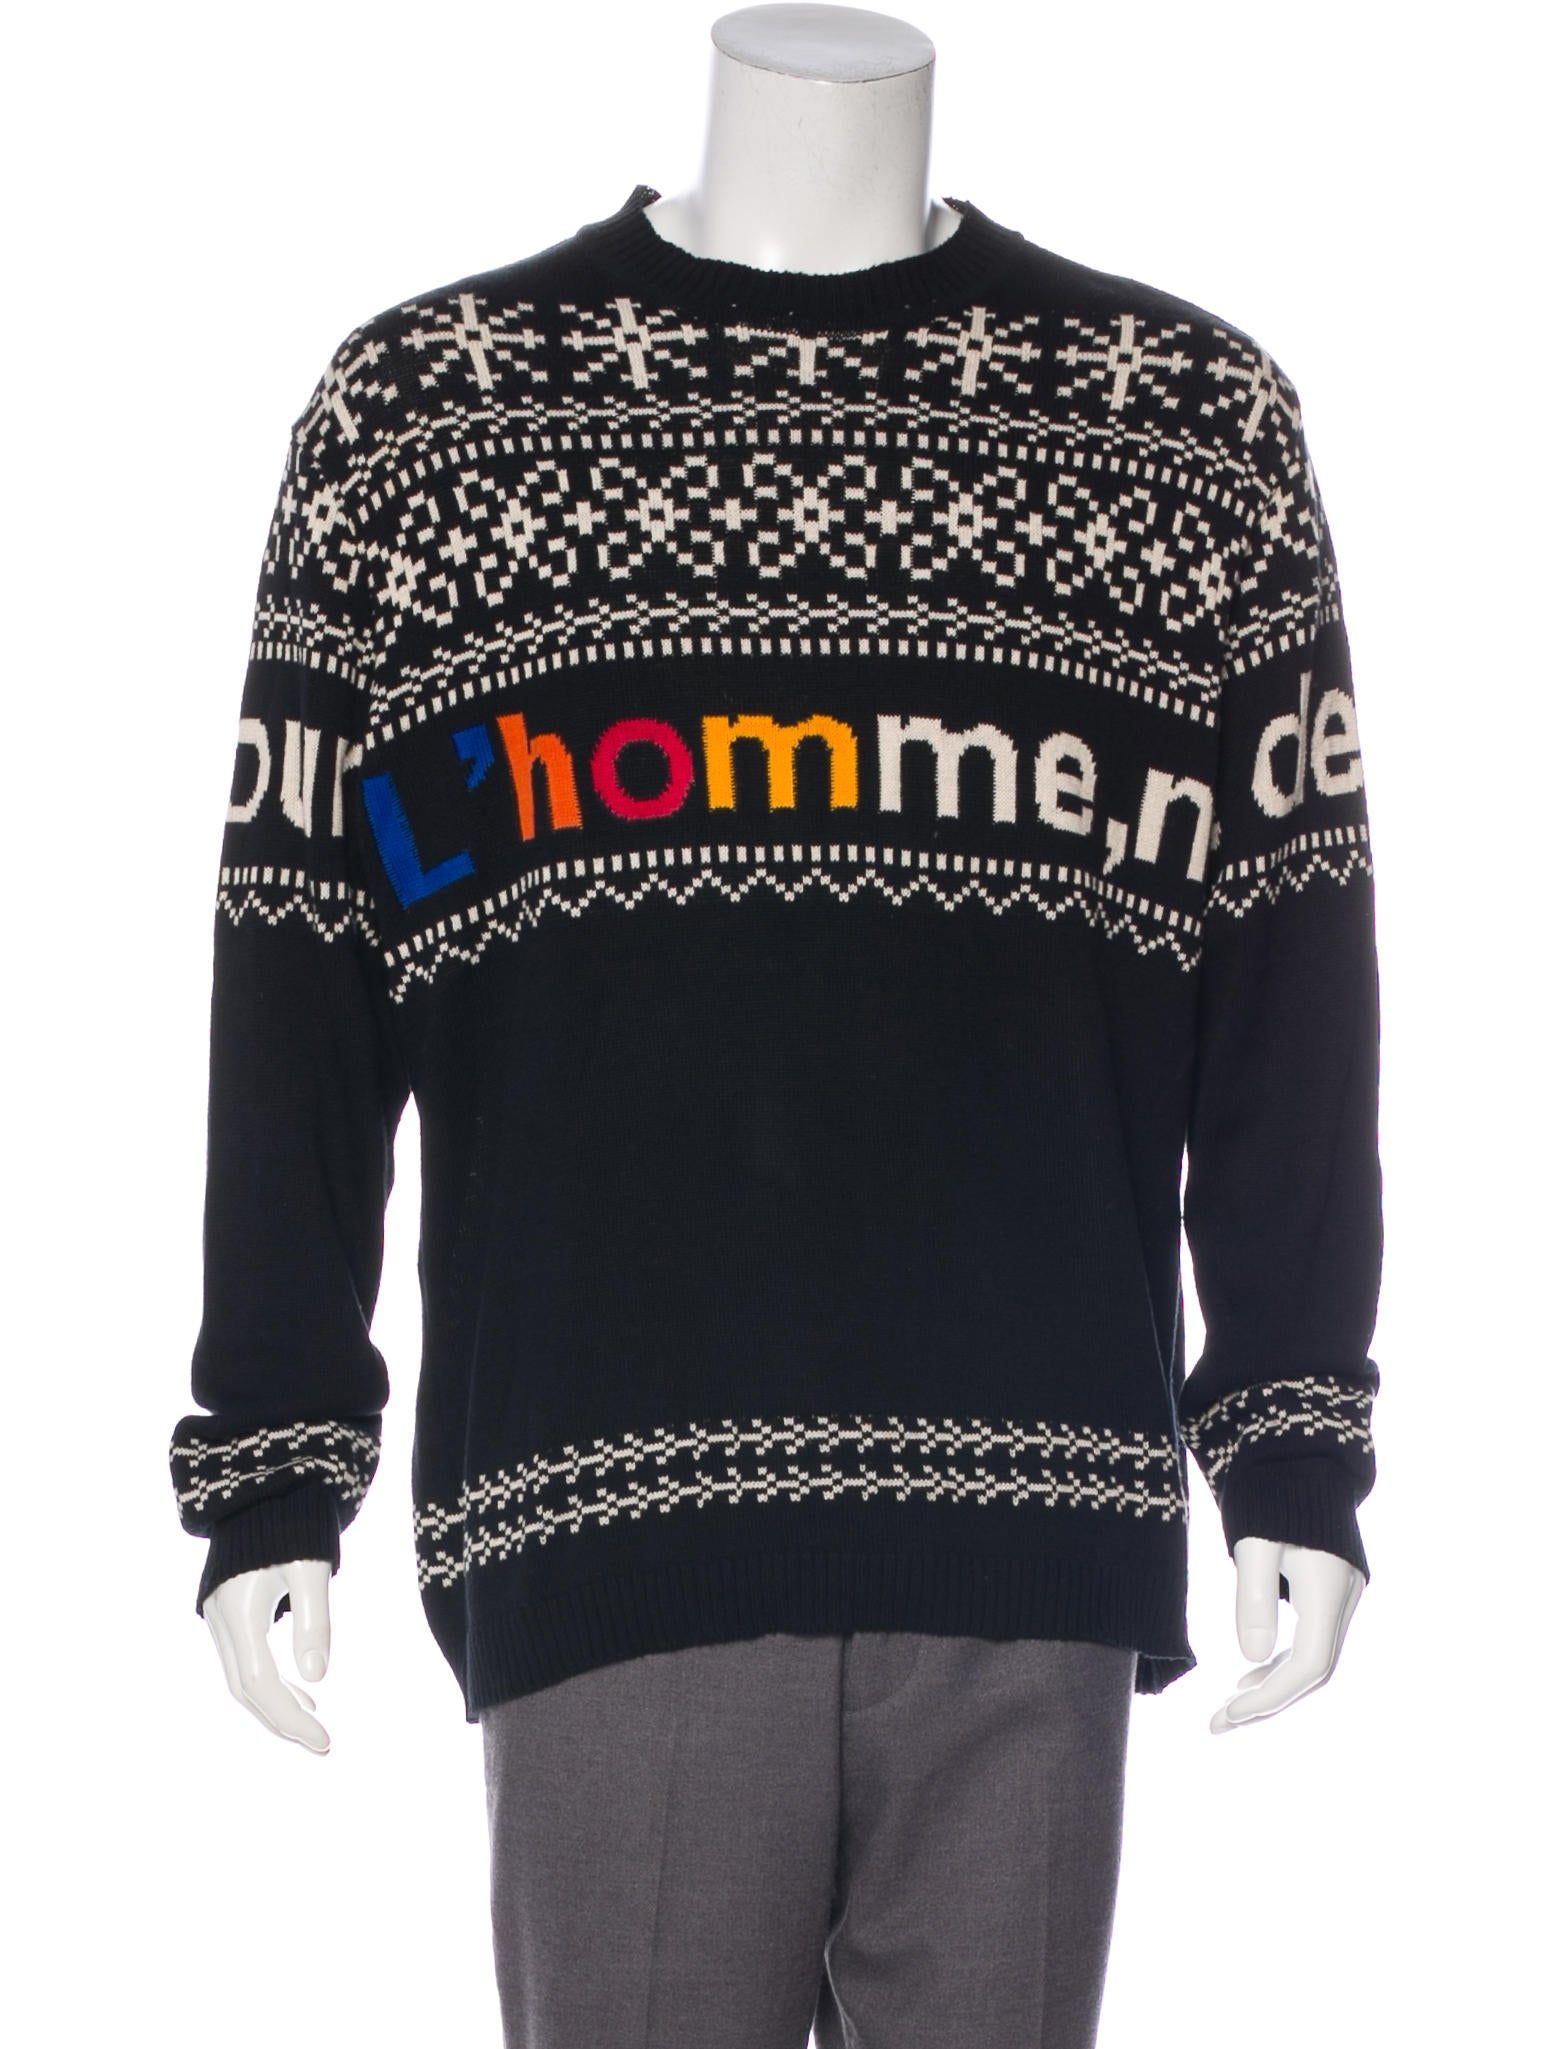 YOHJI YAMAMOTO POUR HOMME Knit Sweater Black Size 3 Cotton Authentic Men USED